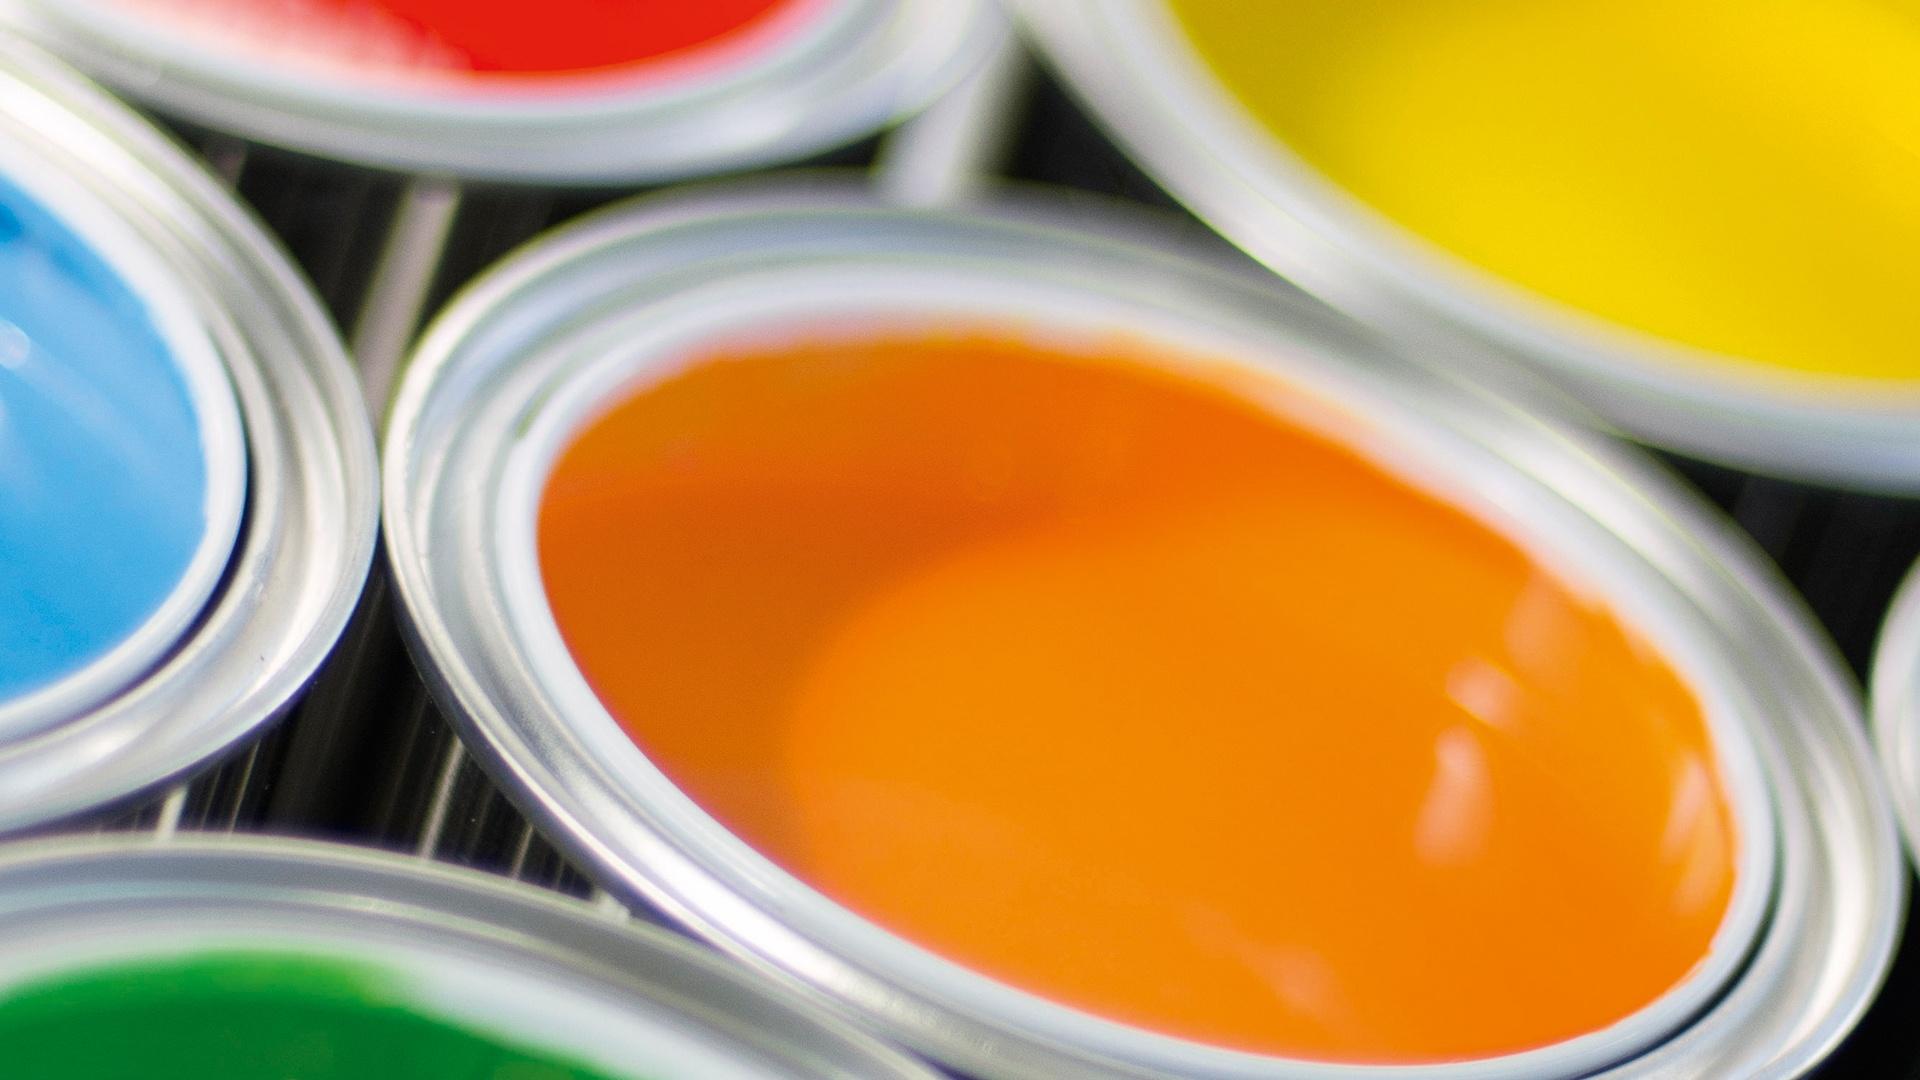 Tintometria: la Formula del Colore